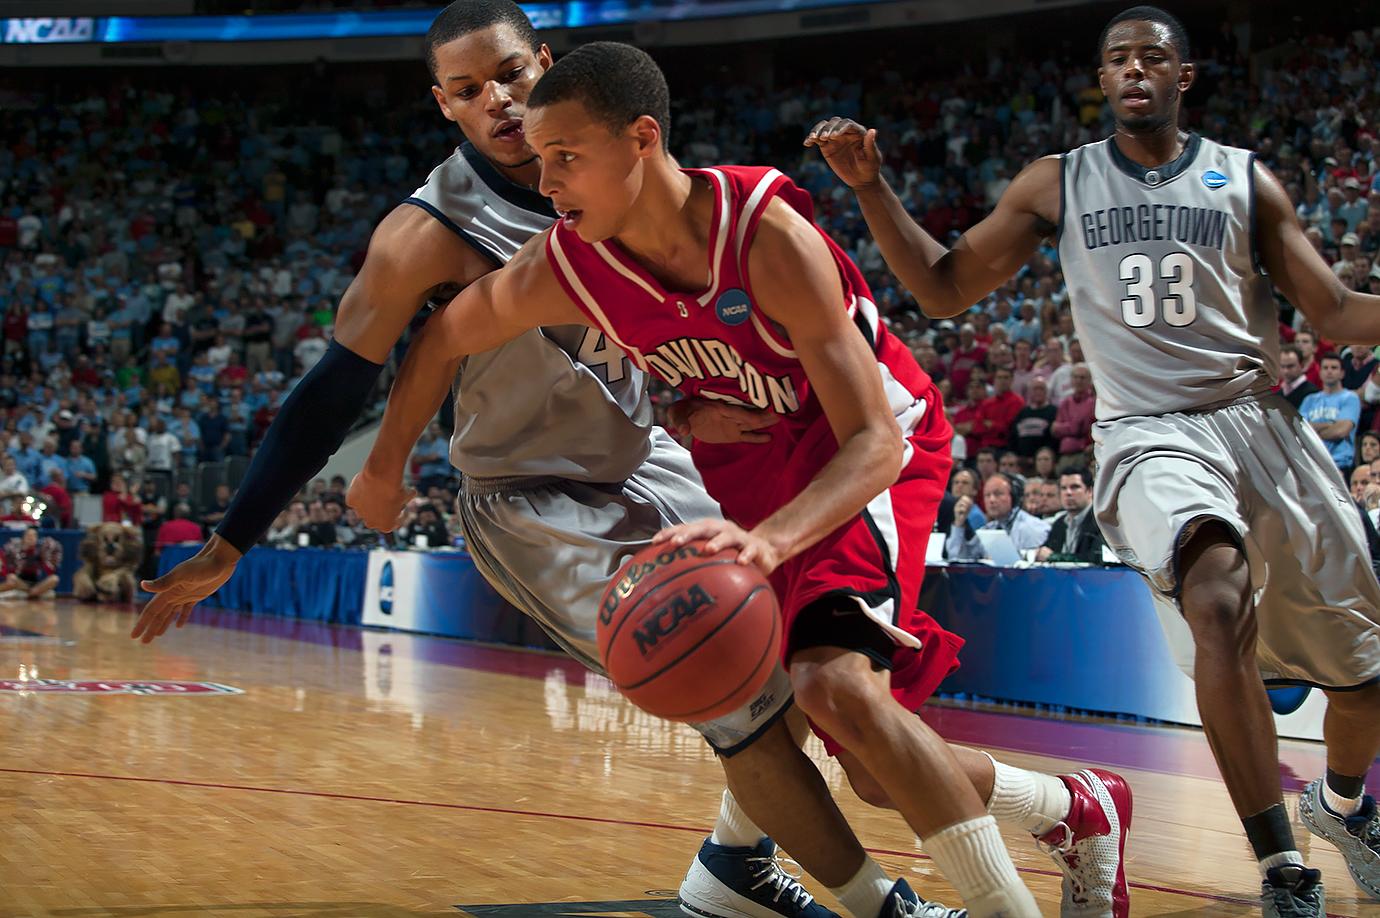 March 23, 2008 —Davidson vs. Georgetown